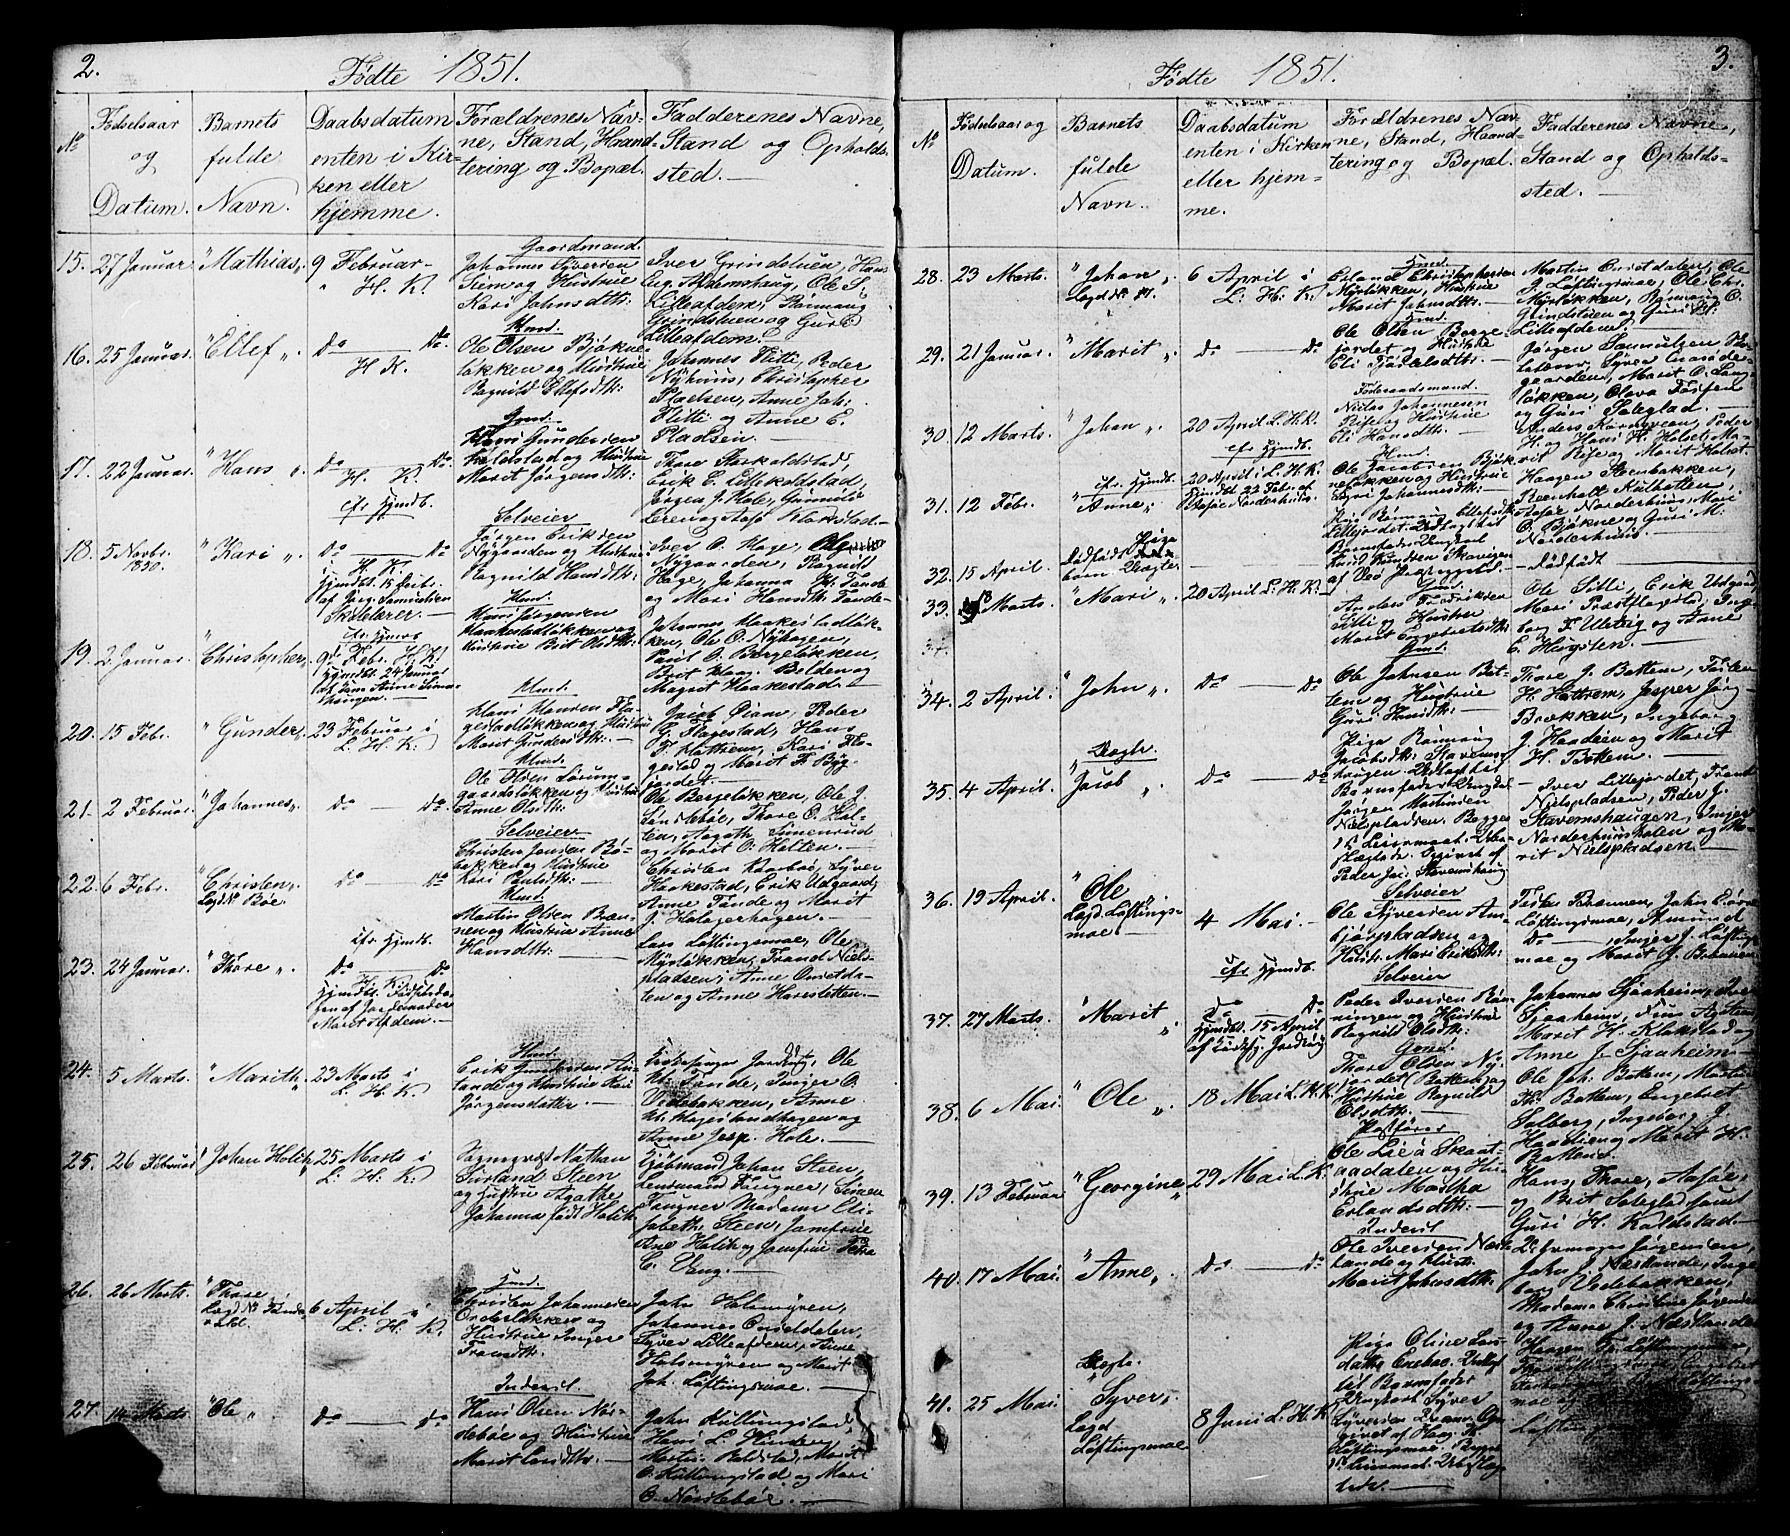 SAH, Lesja prestekontor, Klokkerbok nr. 5, 1850-1894, s. 2-3